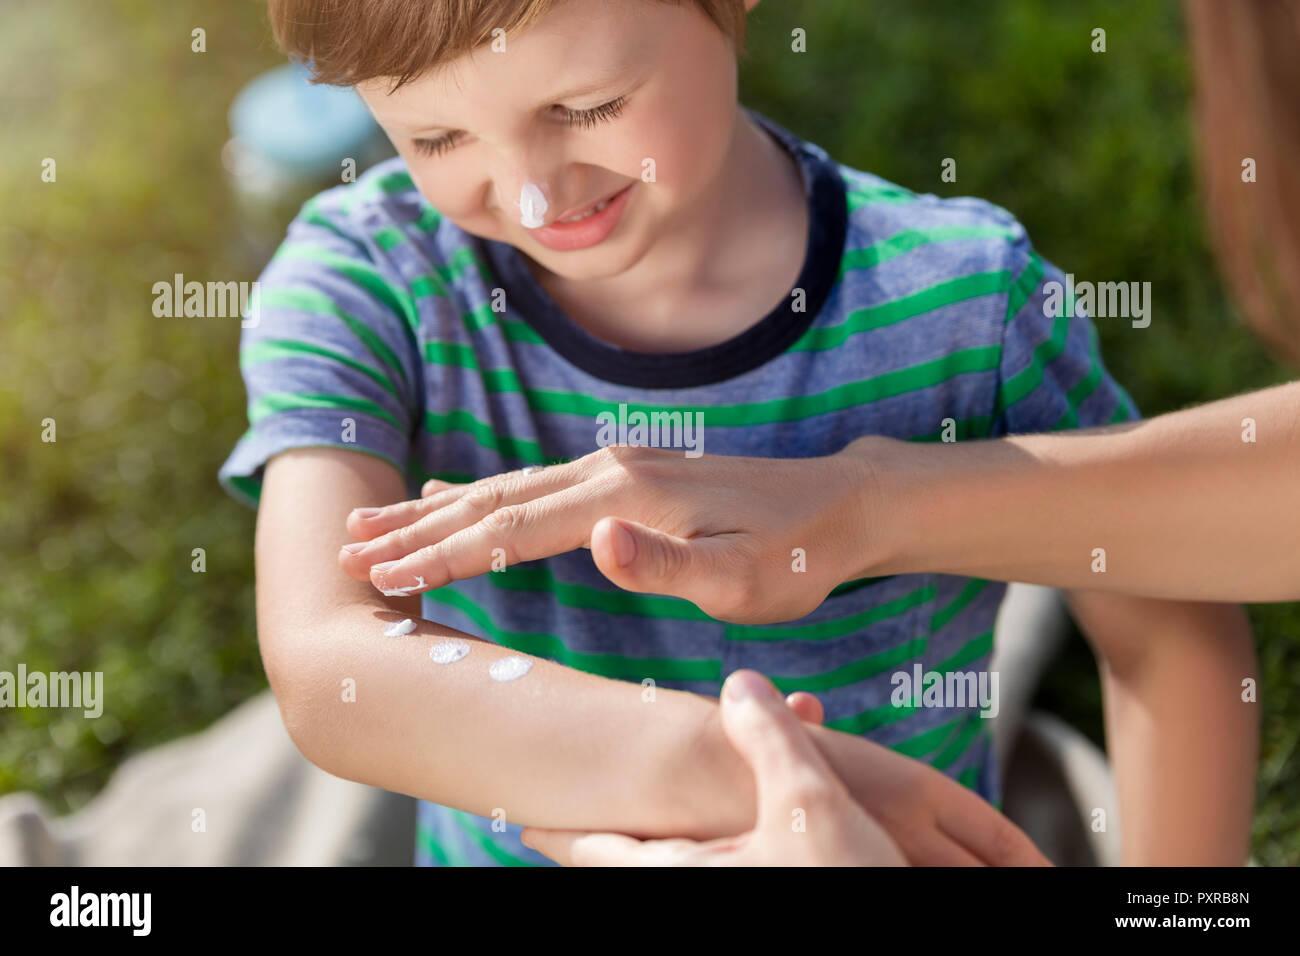 Mother applying suncream on son's arm - Stock Image